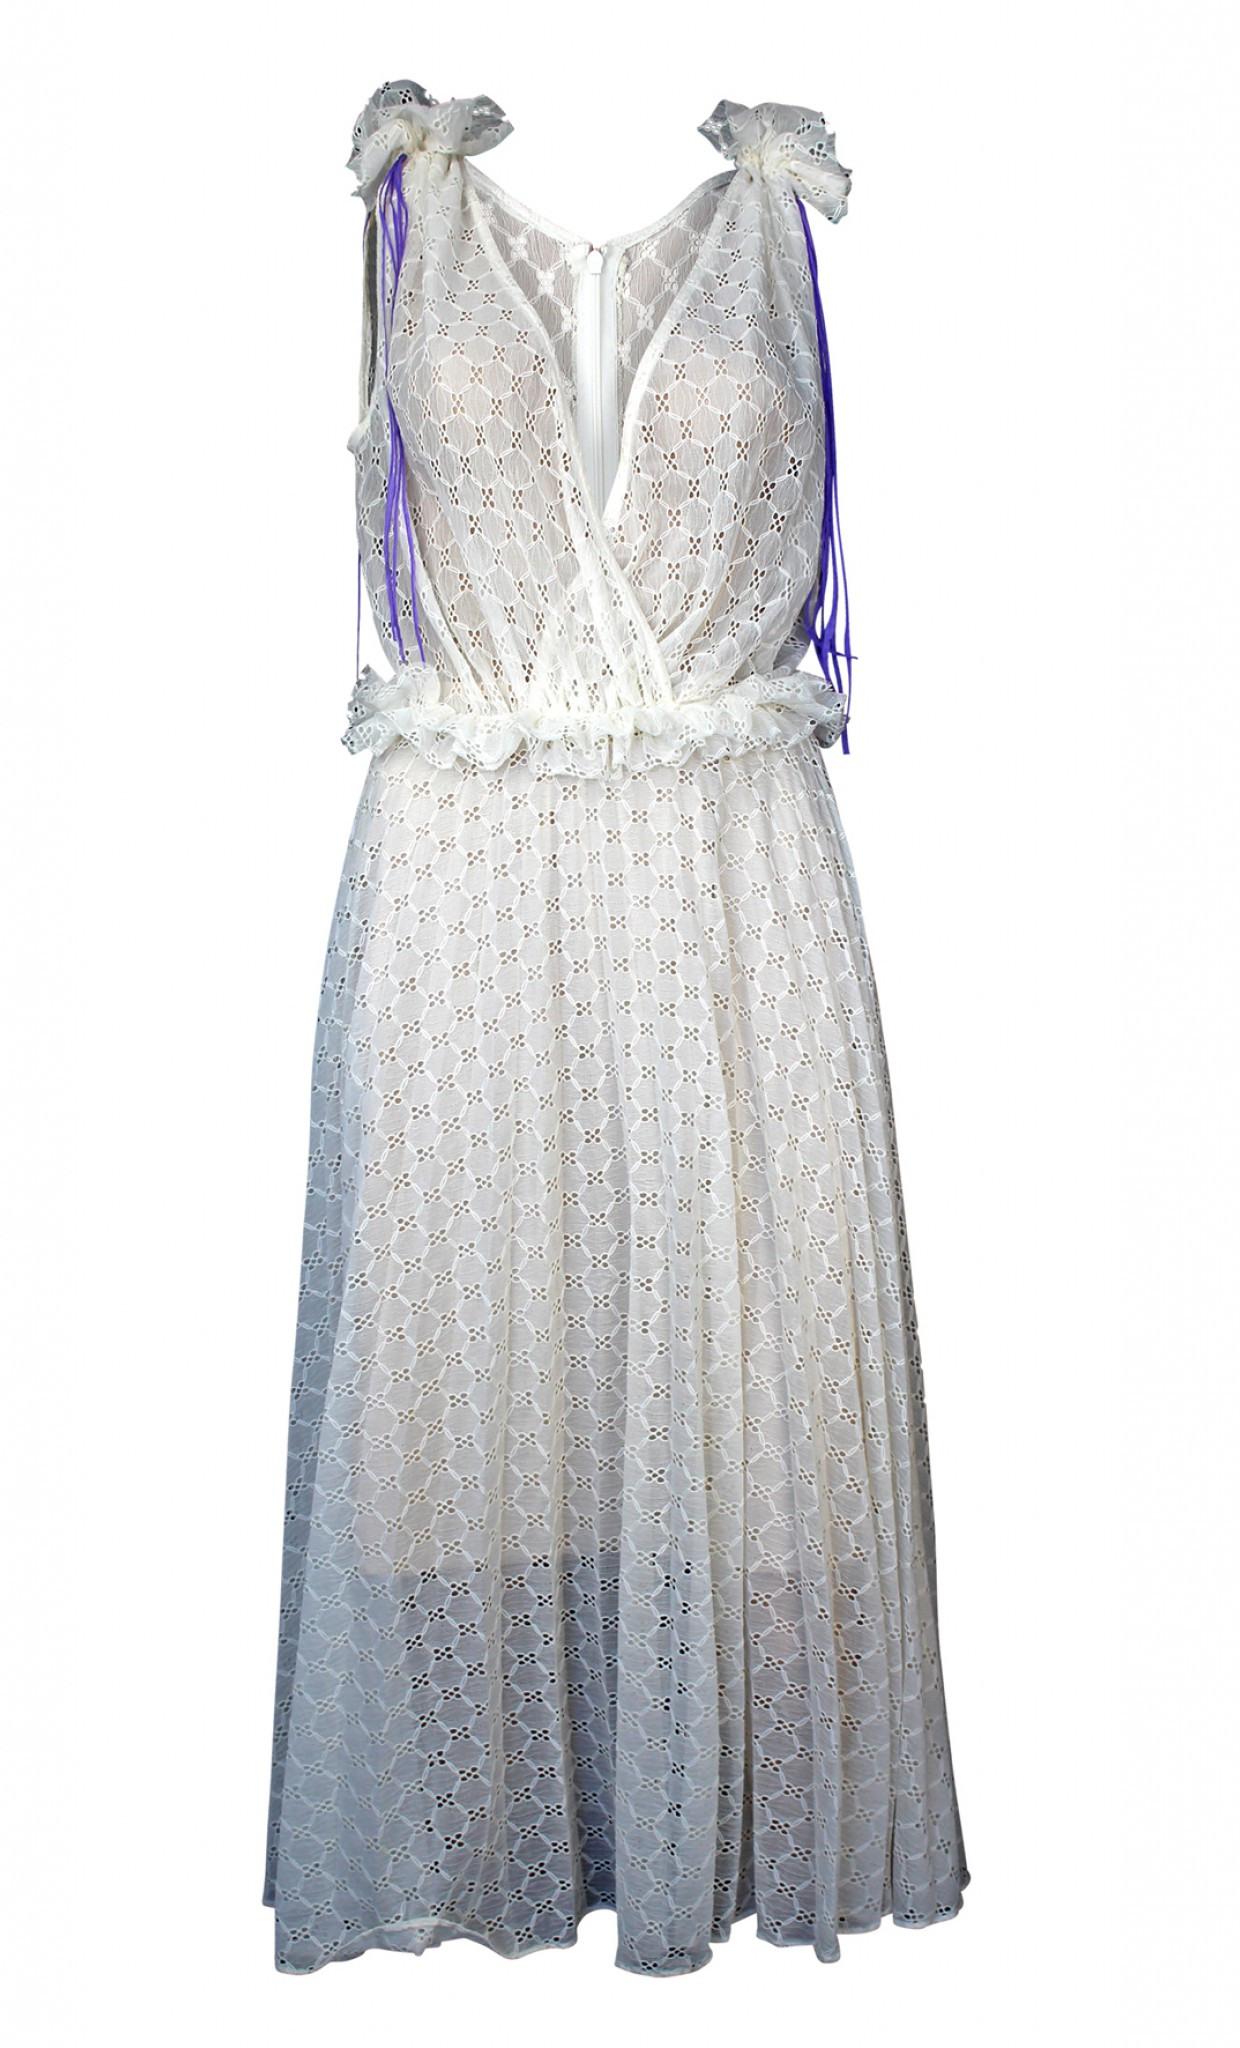 Plissiertes Broderie Anglaise Kleid Aus Viskose